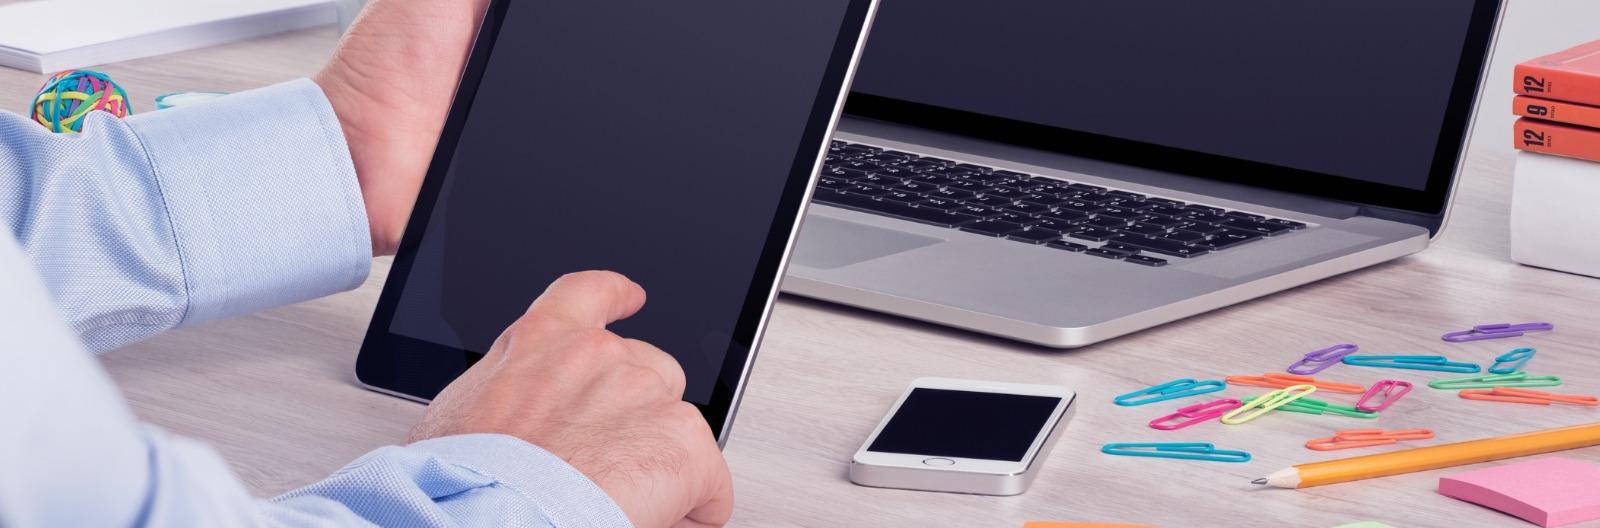 Capito Secure Web Gateway